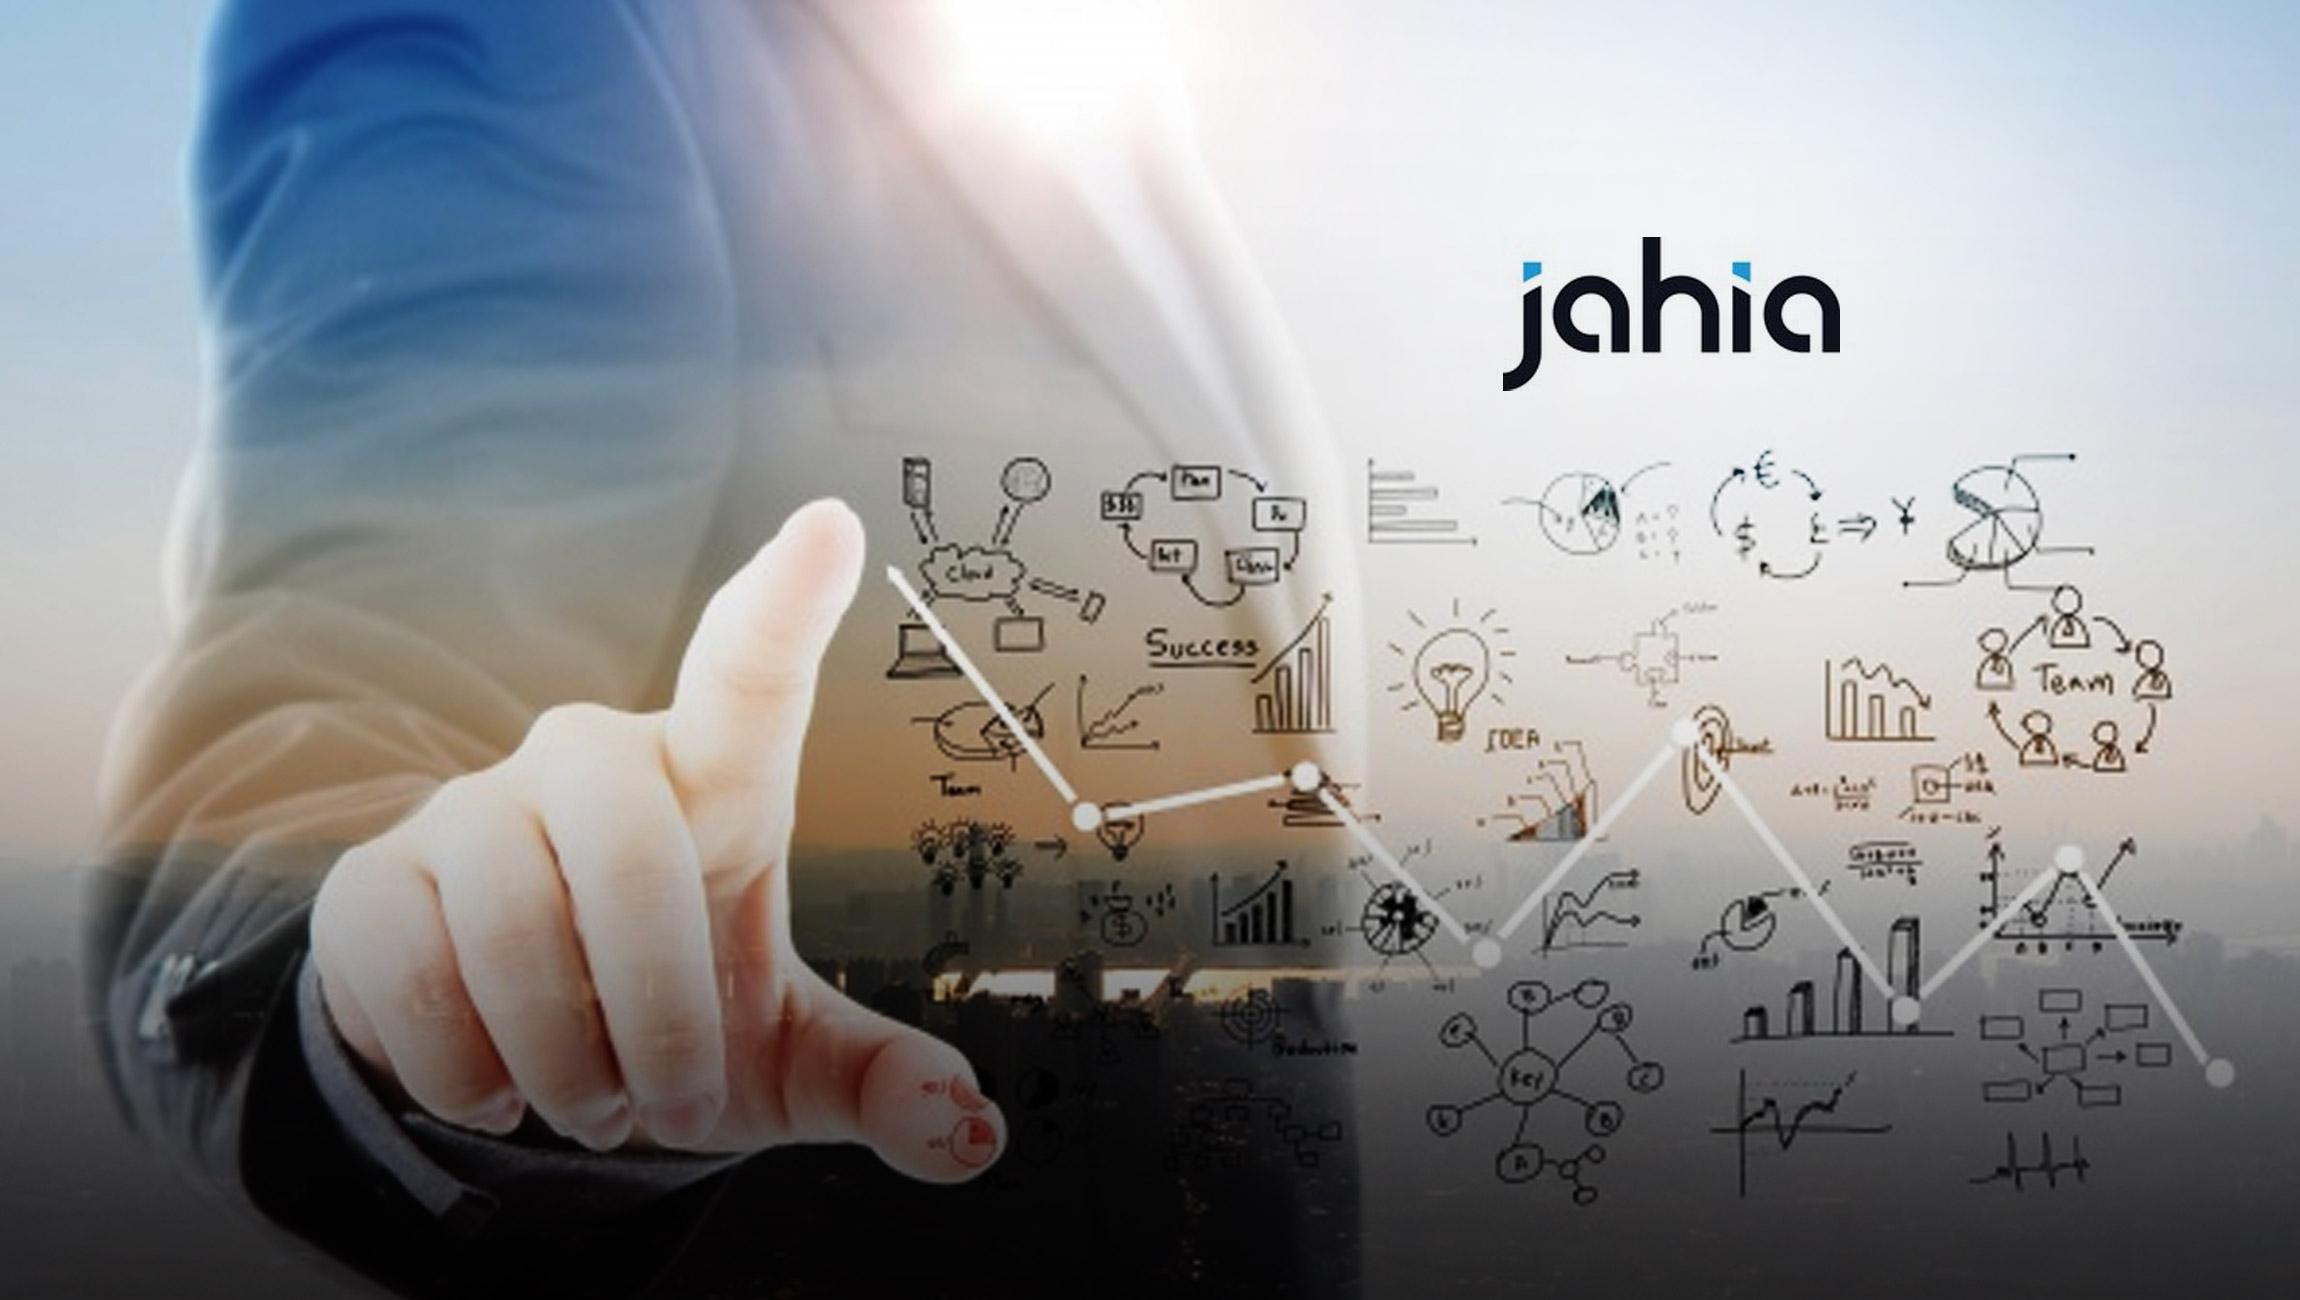 Jahia Hosts Webinar on Customer Data's Impact on DXP